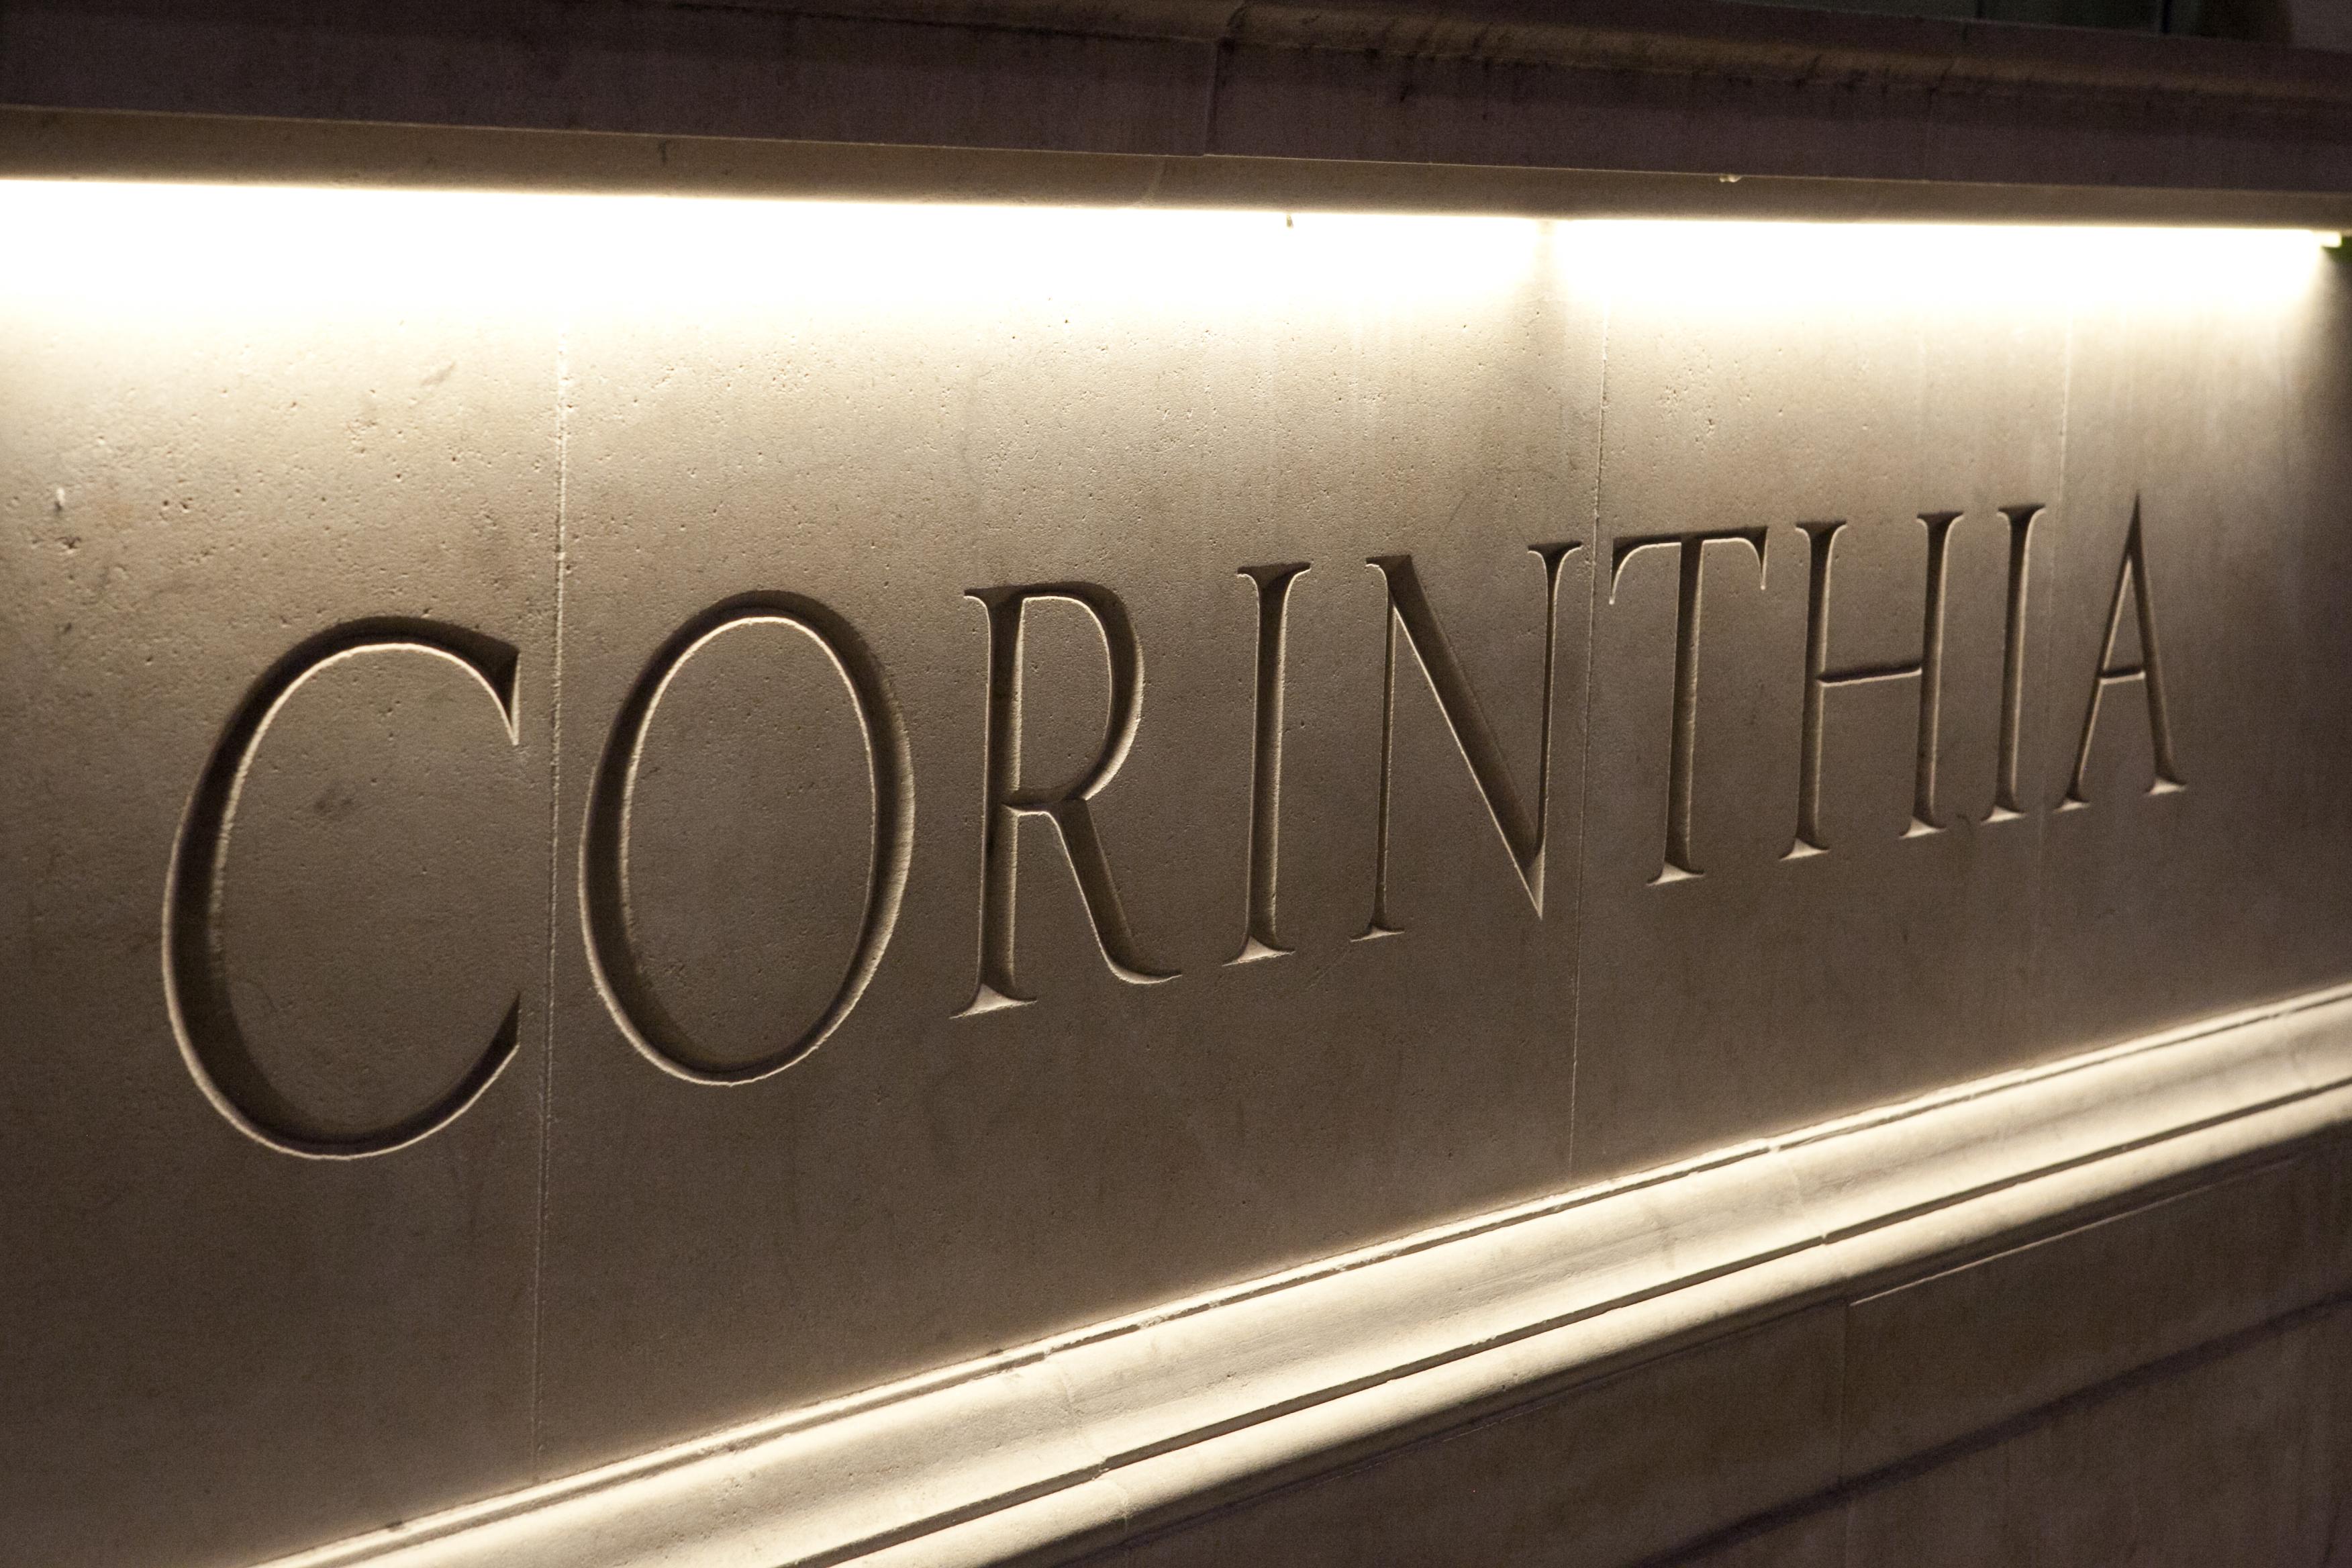 corinthia photographer ©katedarkins